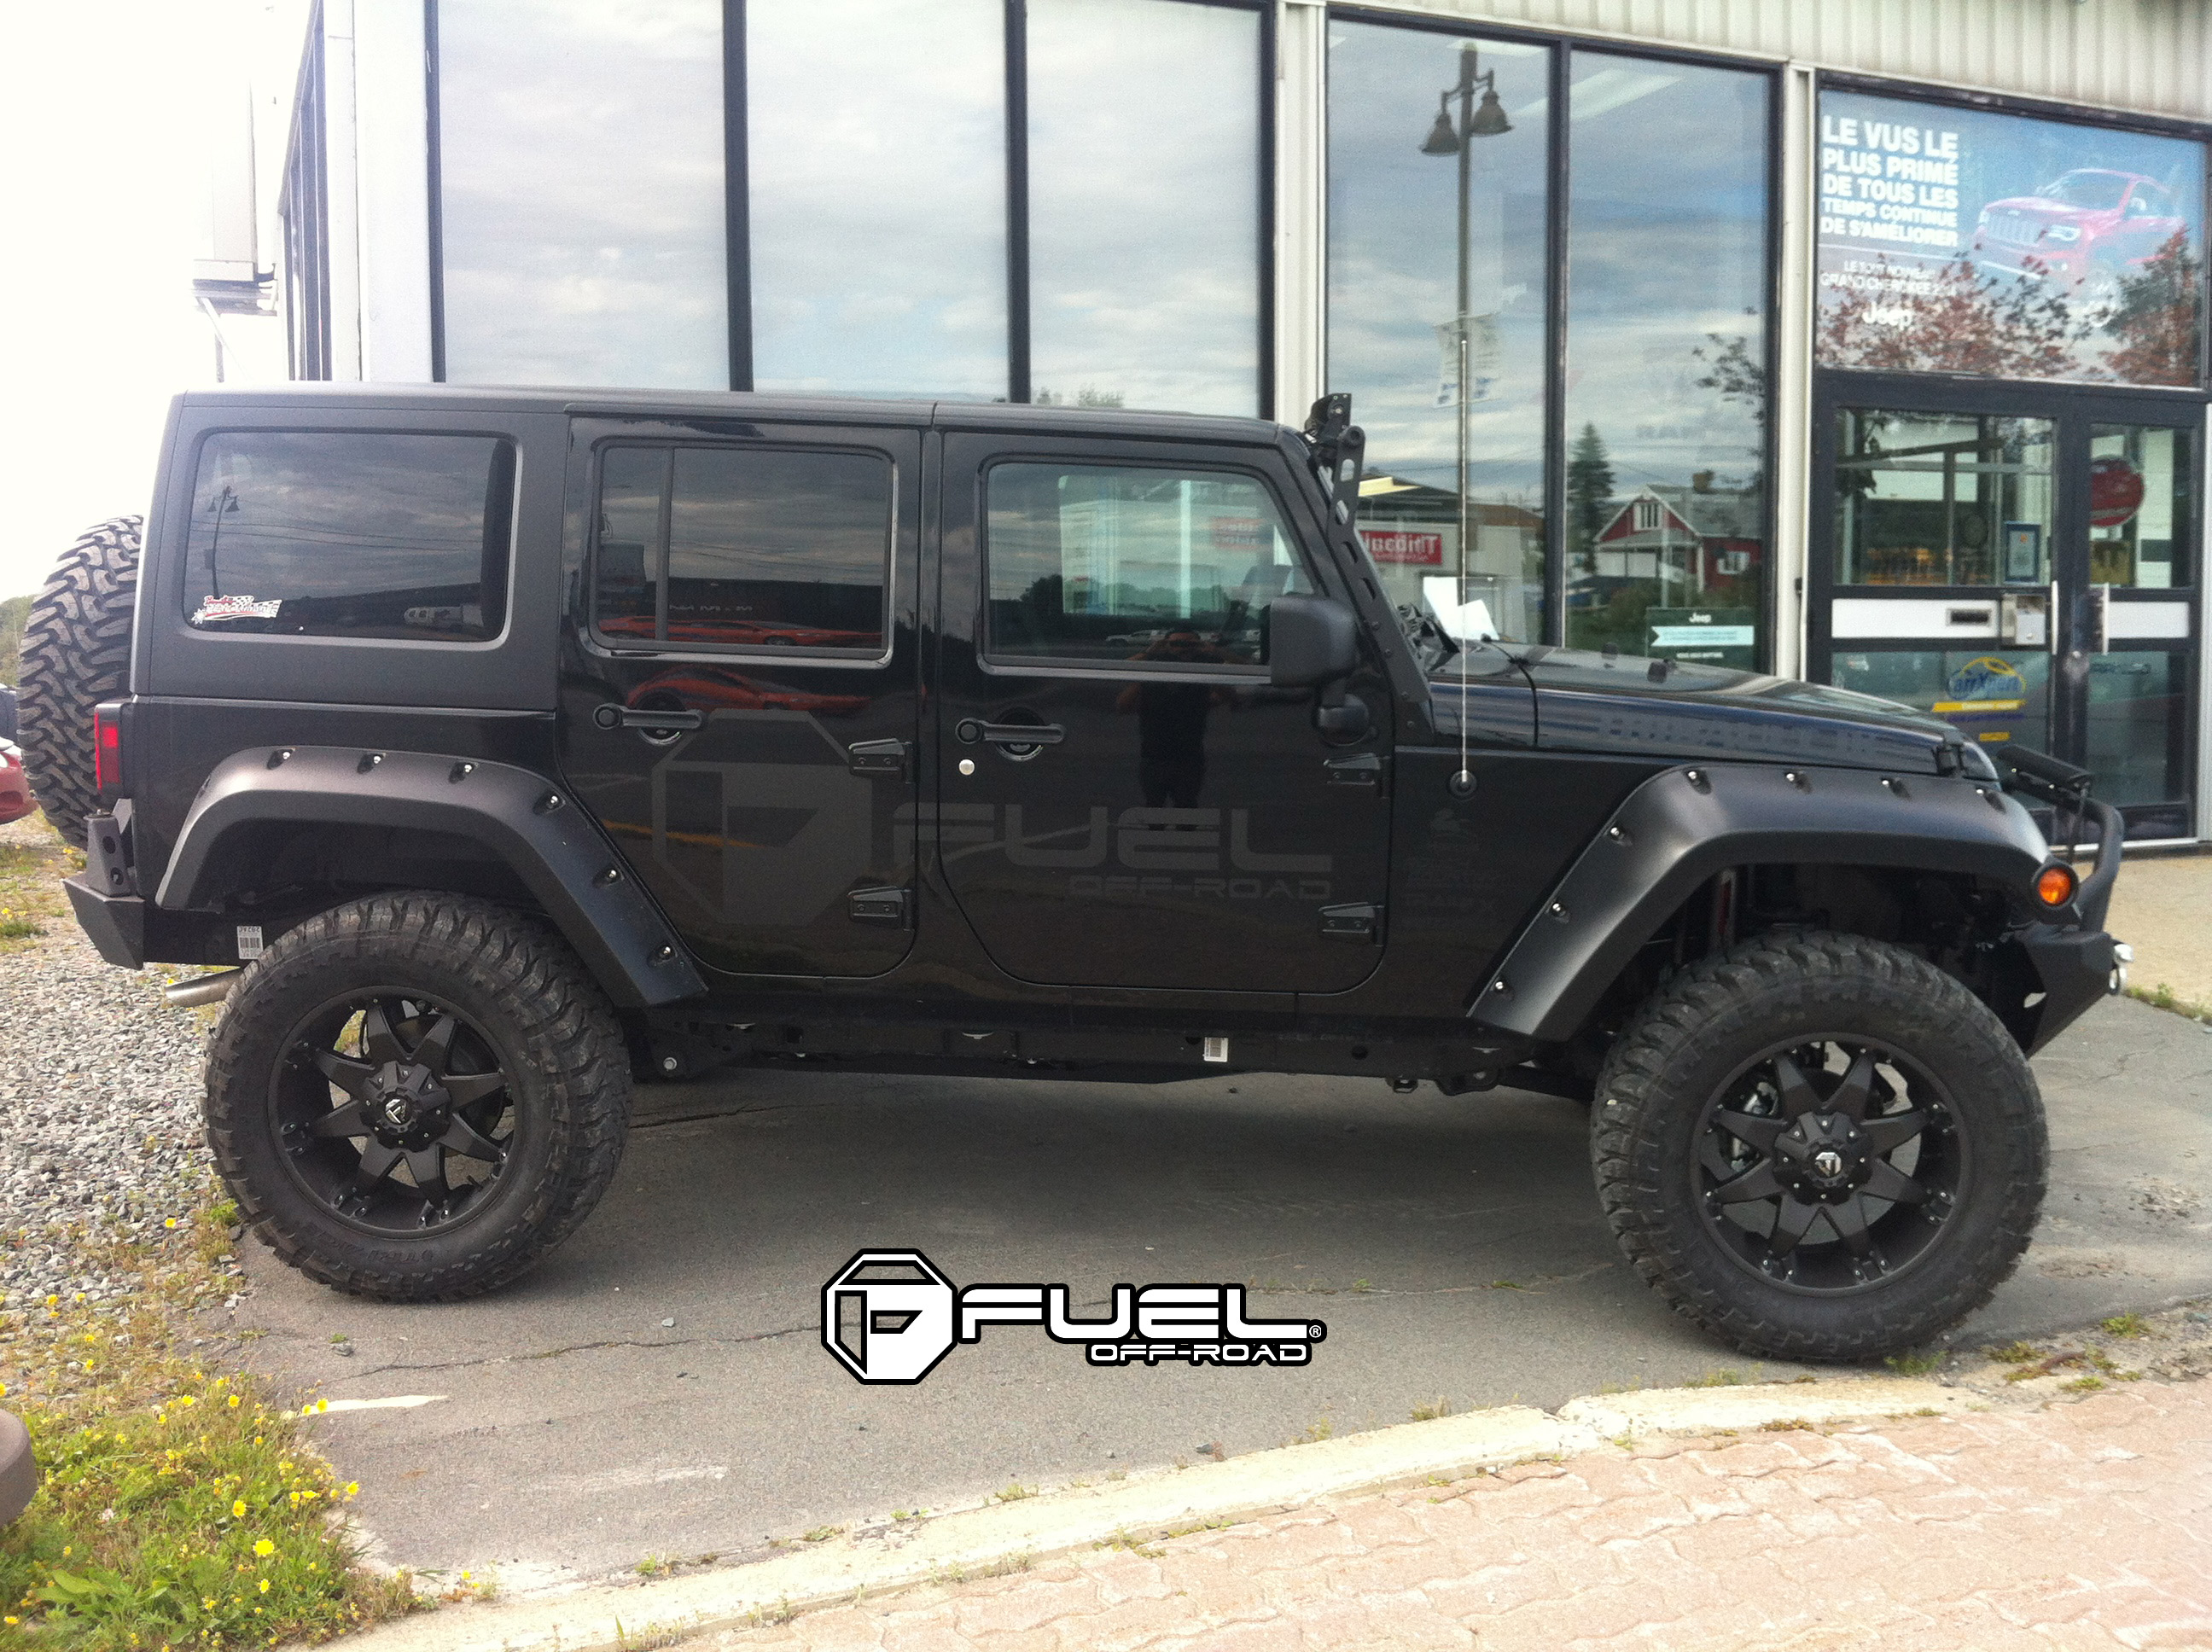 Jeep Wrangler Black Wheels Jeep Wrangler